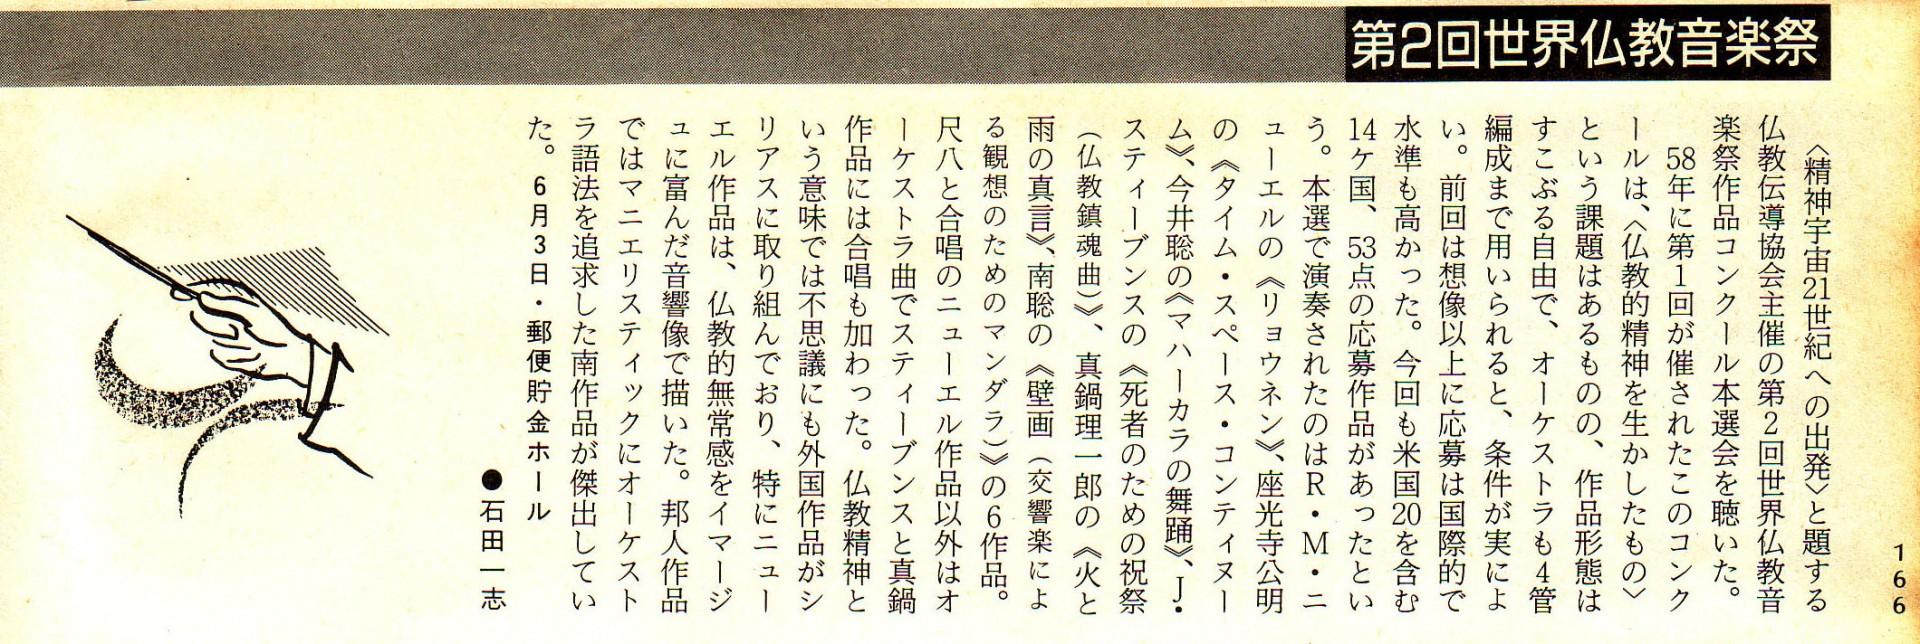 008 Music Appreciation Concert Report Essay Example Fascinating Review 1920